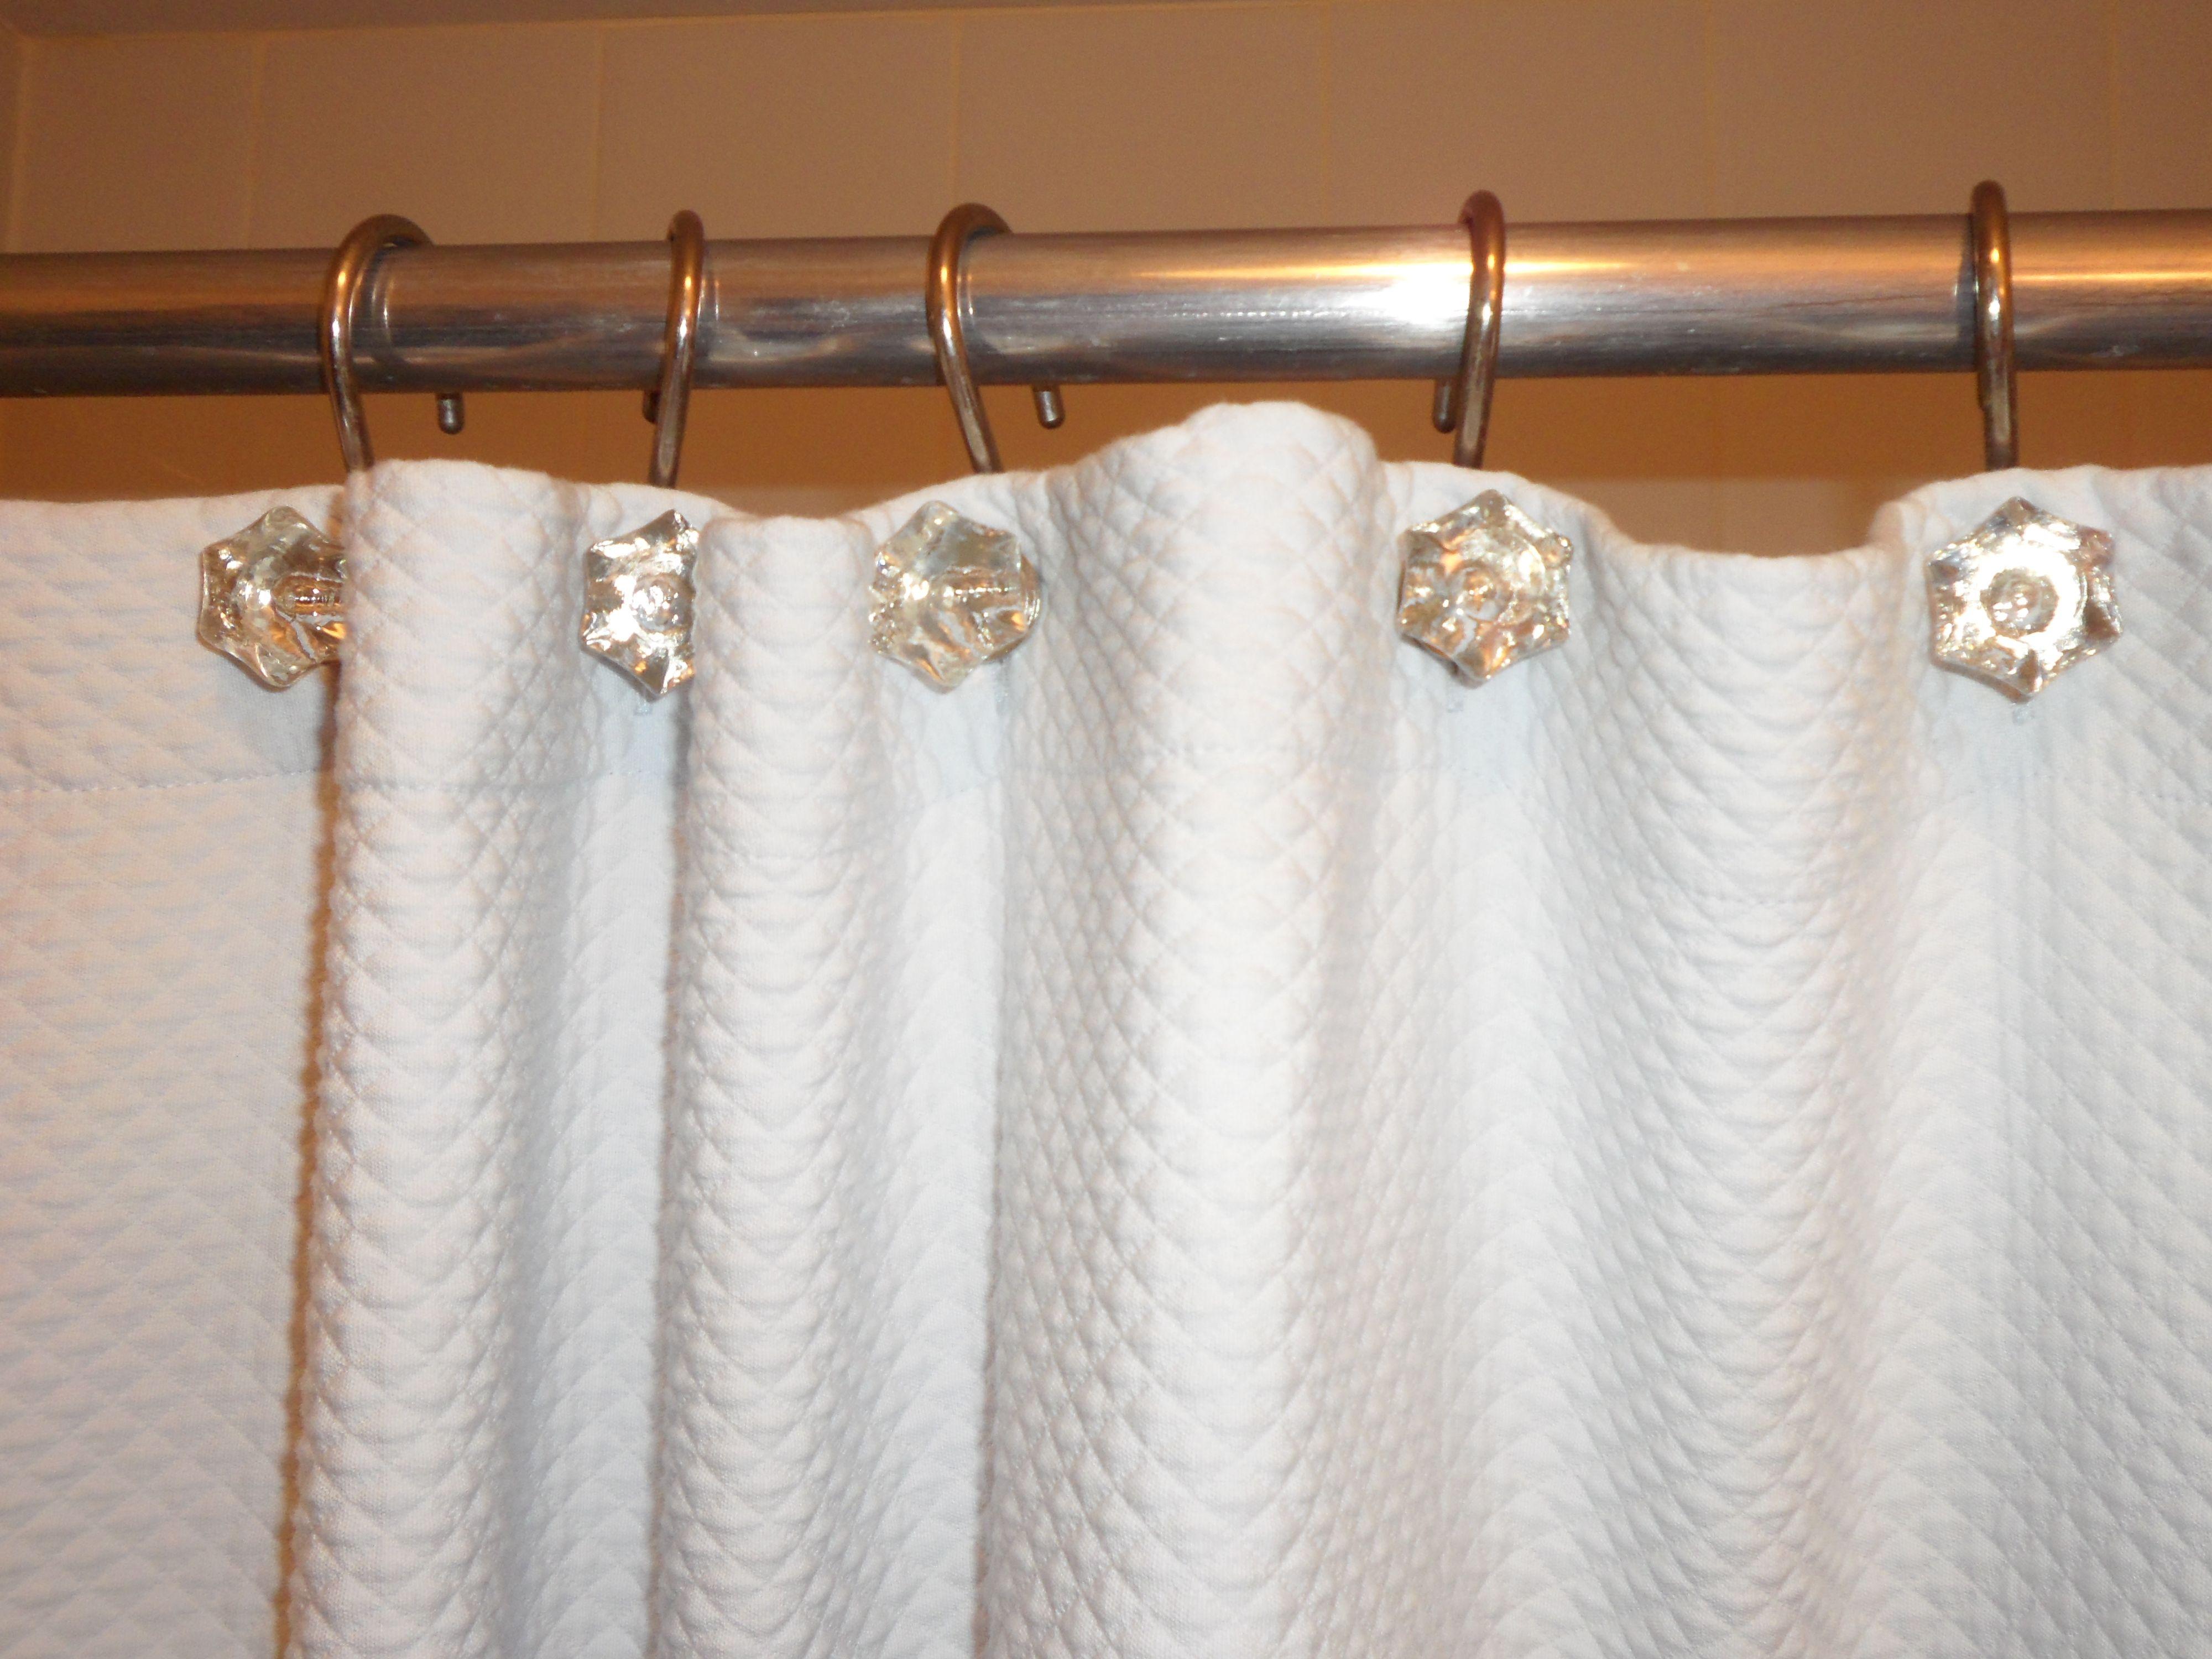 Diamond Shower Curtain Hooks restoration hardware Redo Pinterest ...